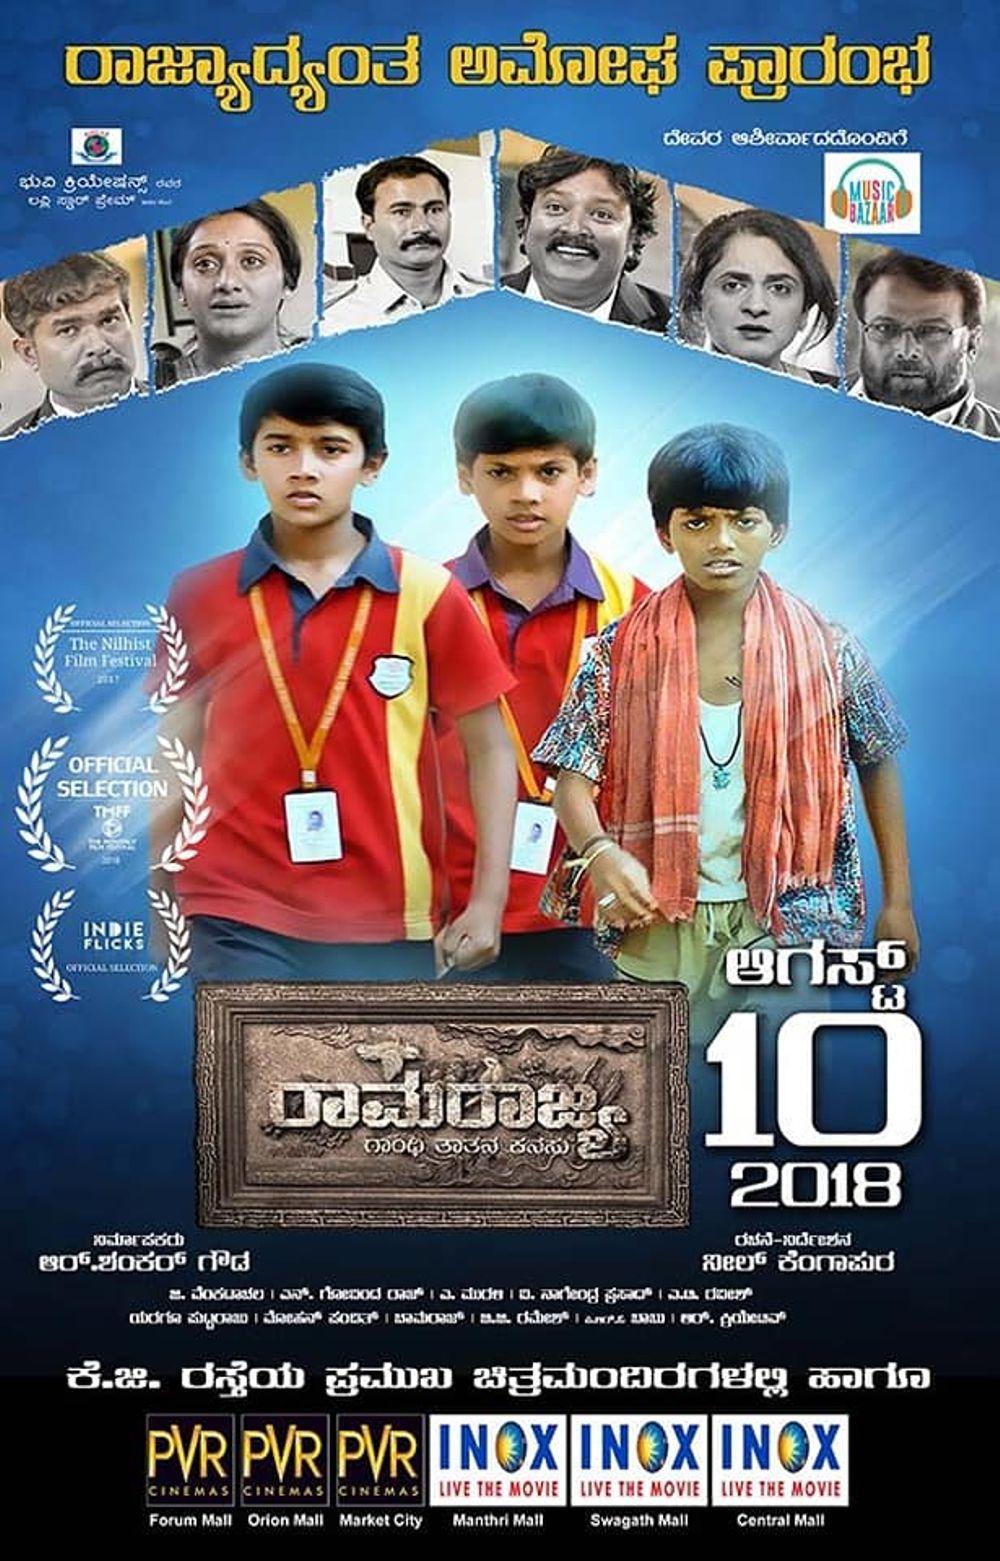 Ramarajya Movie Review